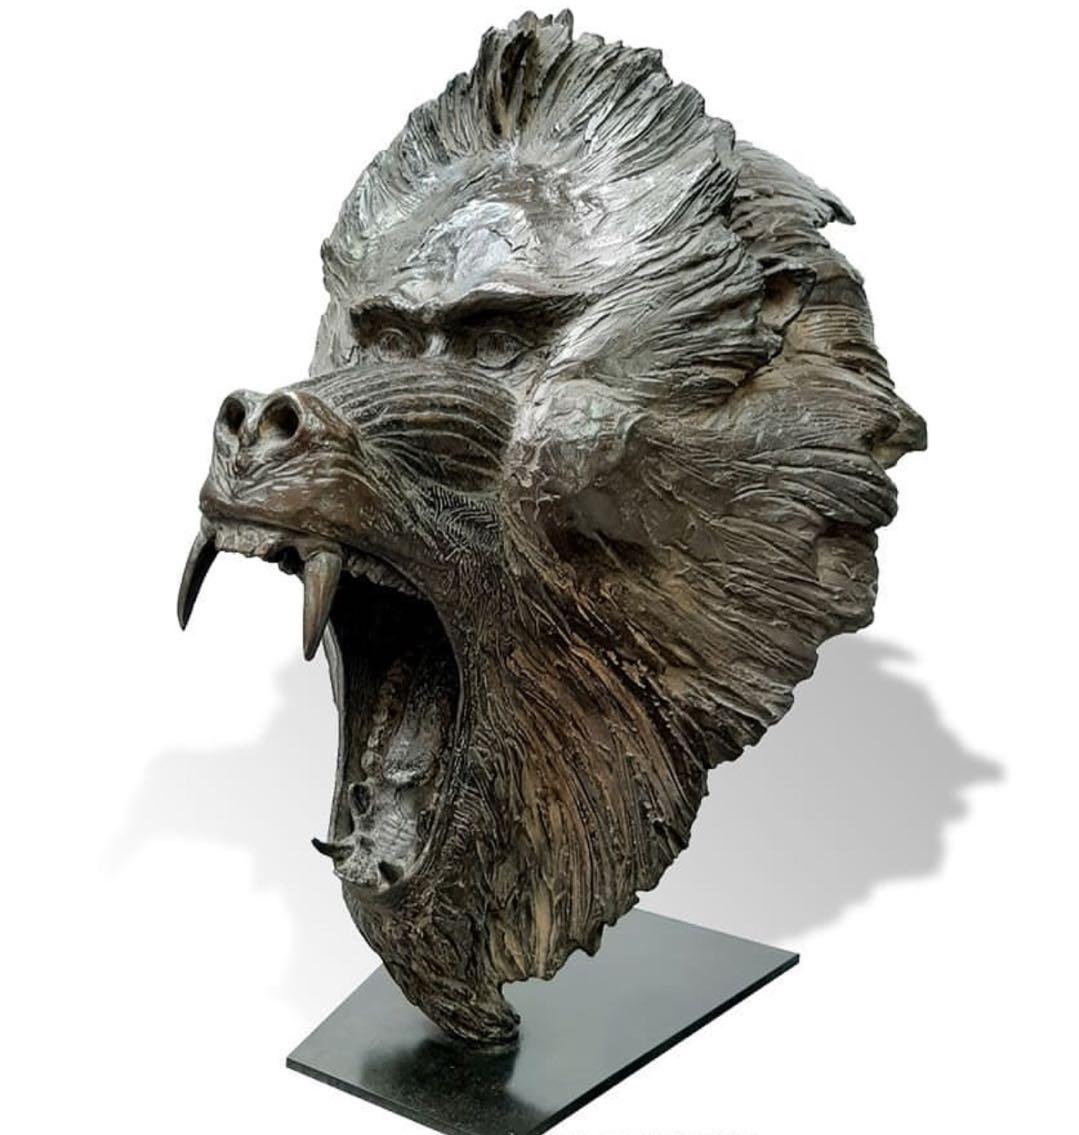 Black orangutan head sculpture